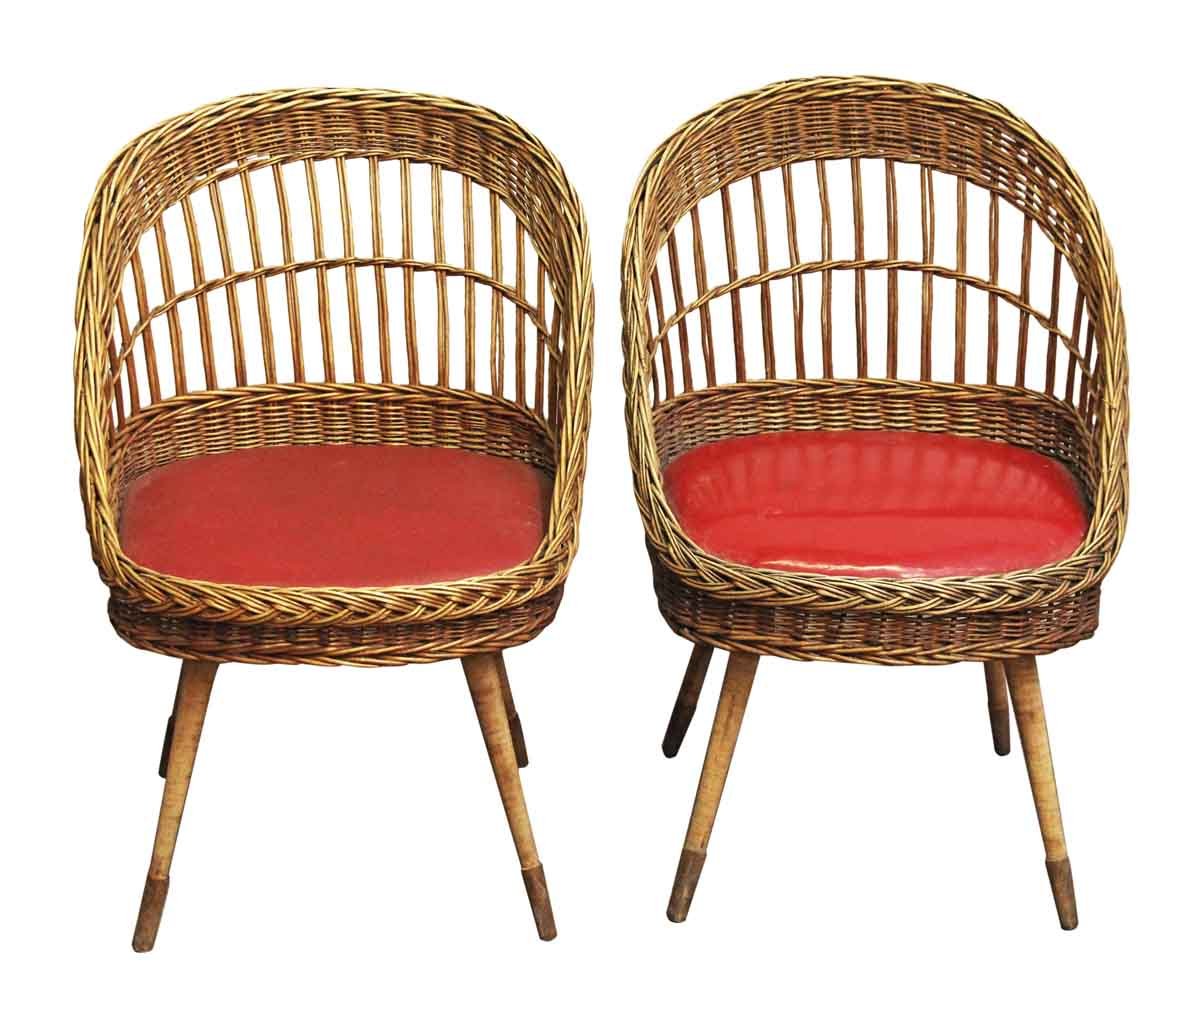 Pair of European Red Rattan Chairs | Olde Good Things